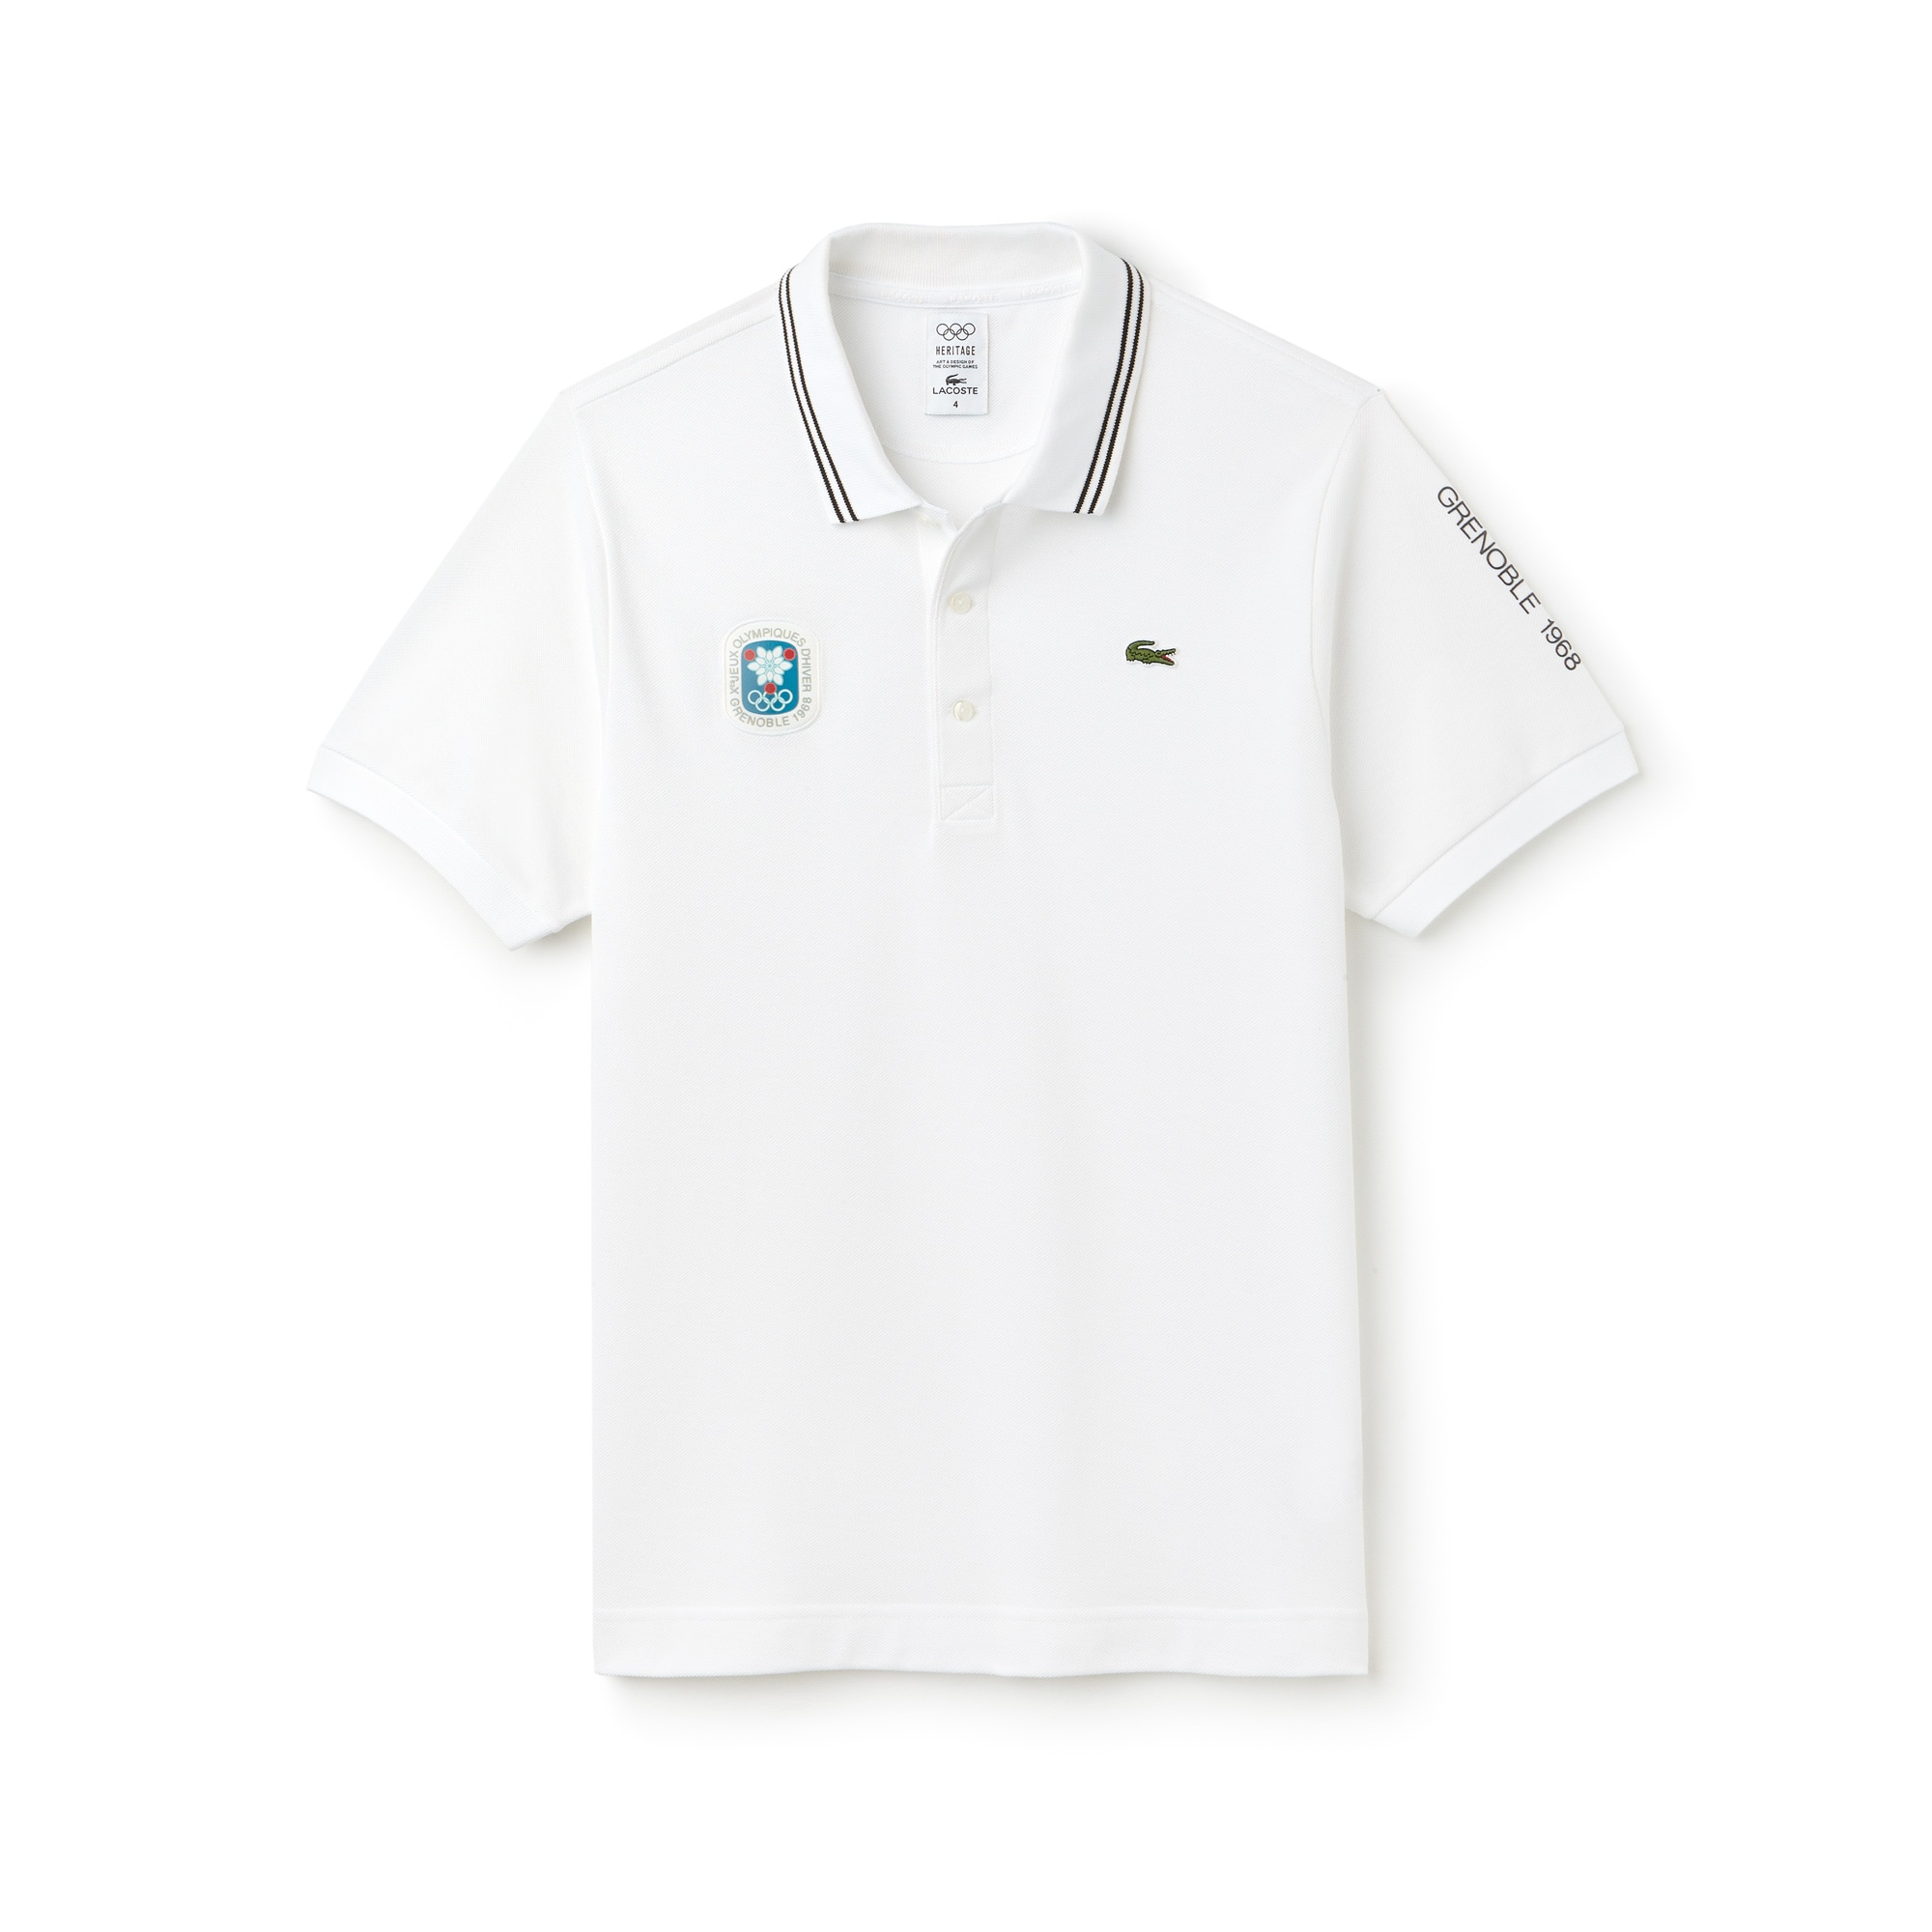 Lacoste SPORT系列冬奥会纪念版男士小凸纹网眼面料Polo衫